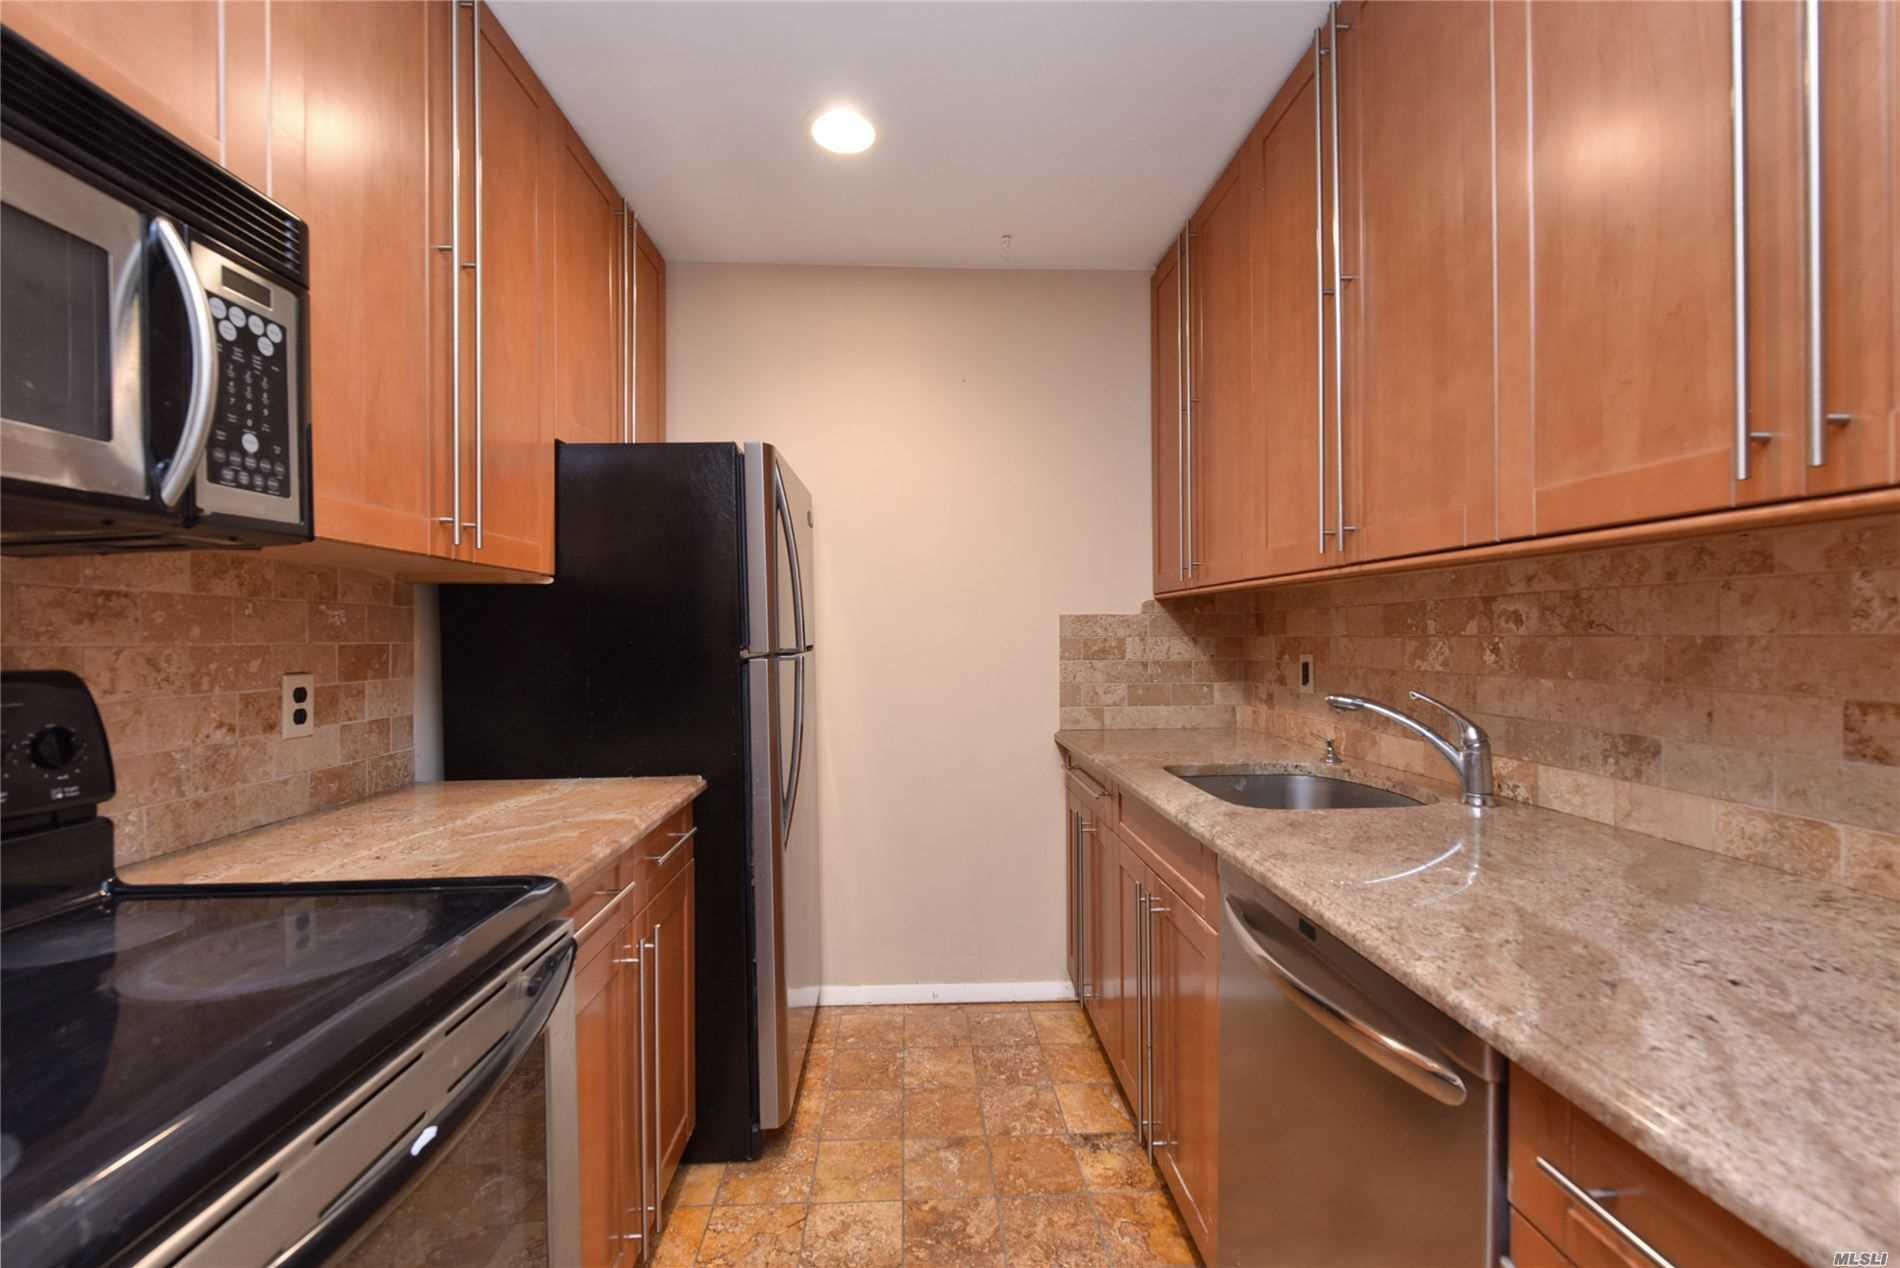 Property for sale at 425 Shore Road # 1B, Long Beach NY 11561, Long Beach,  New York 11561